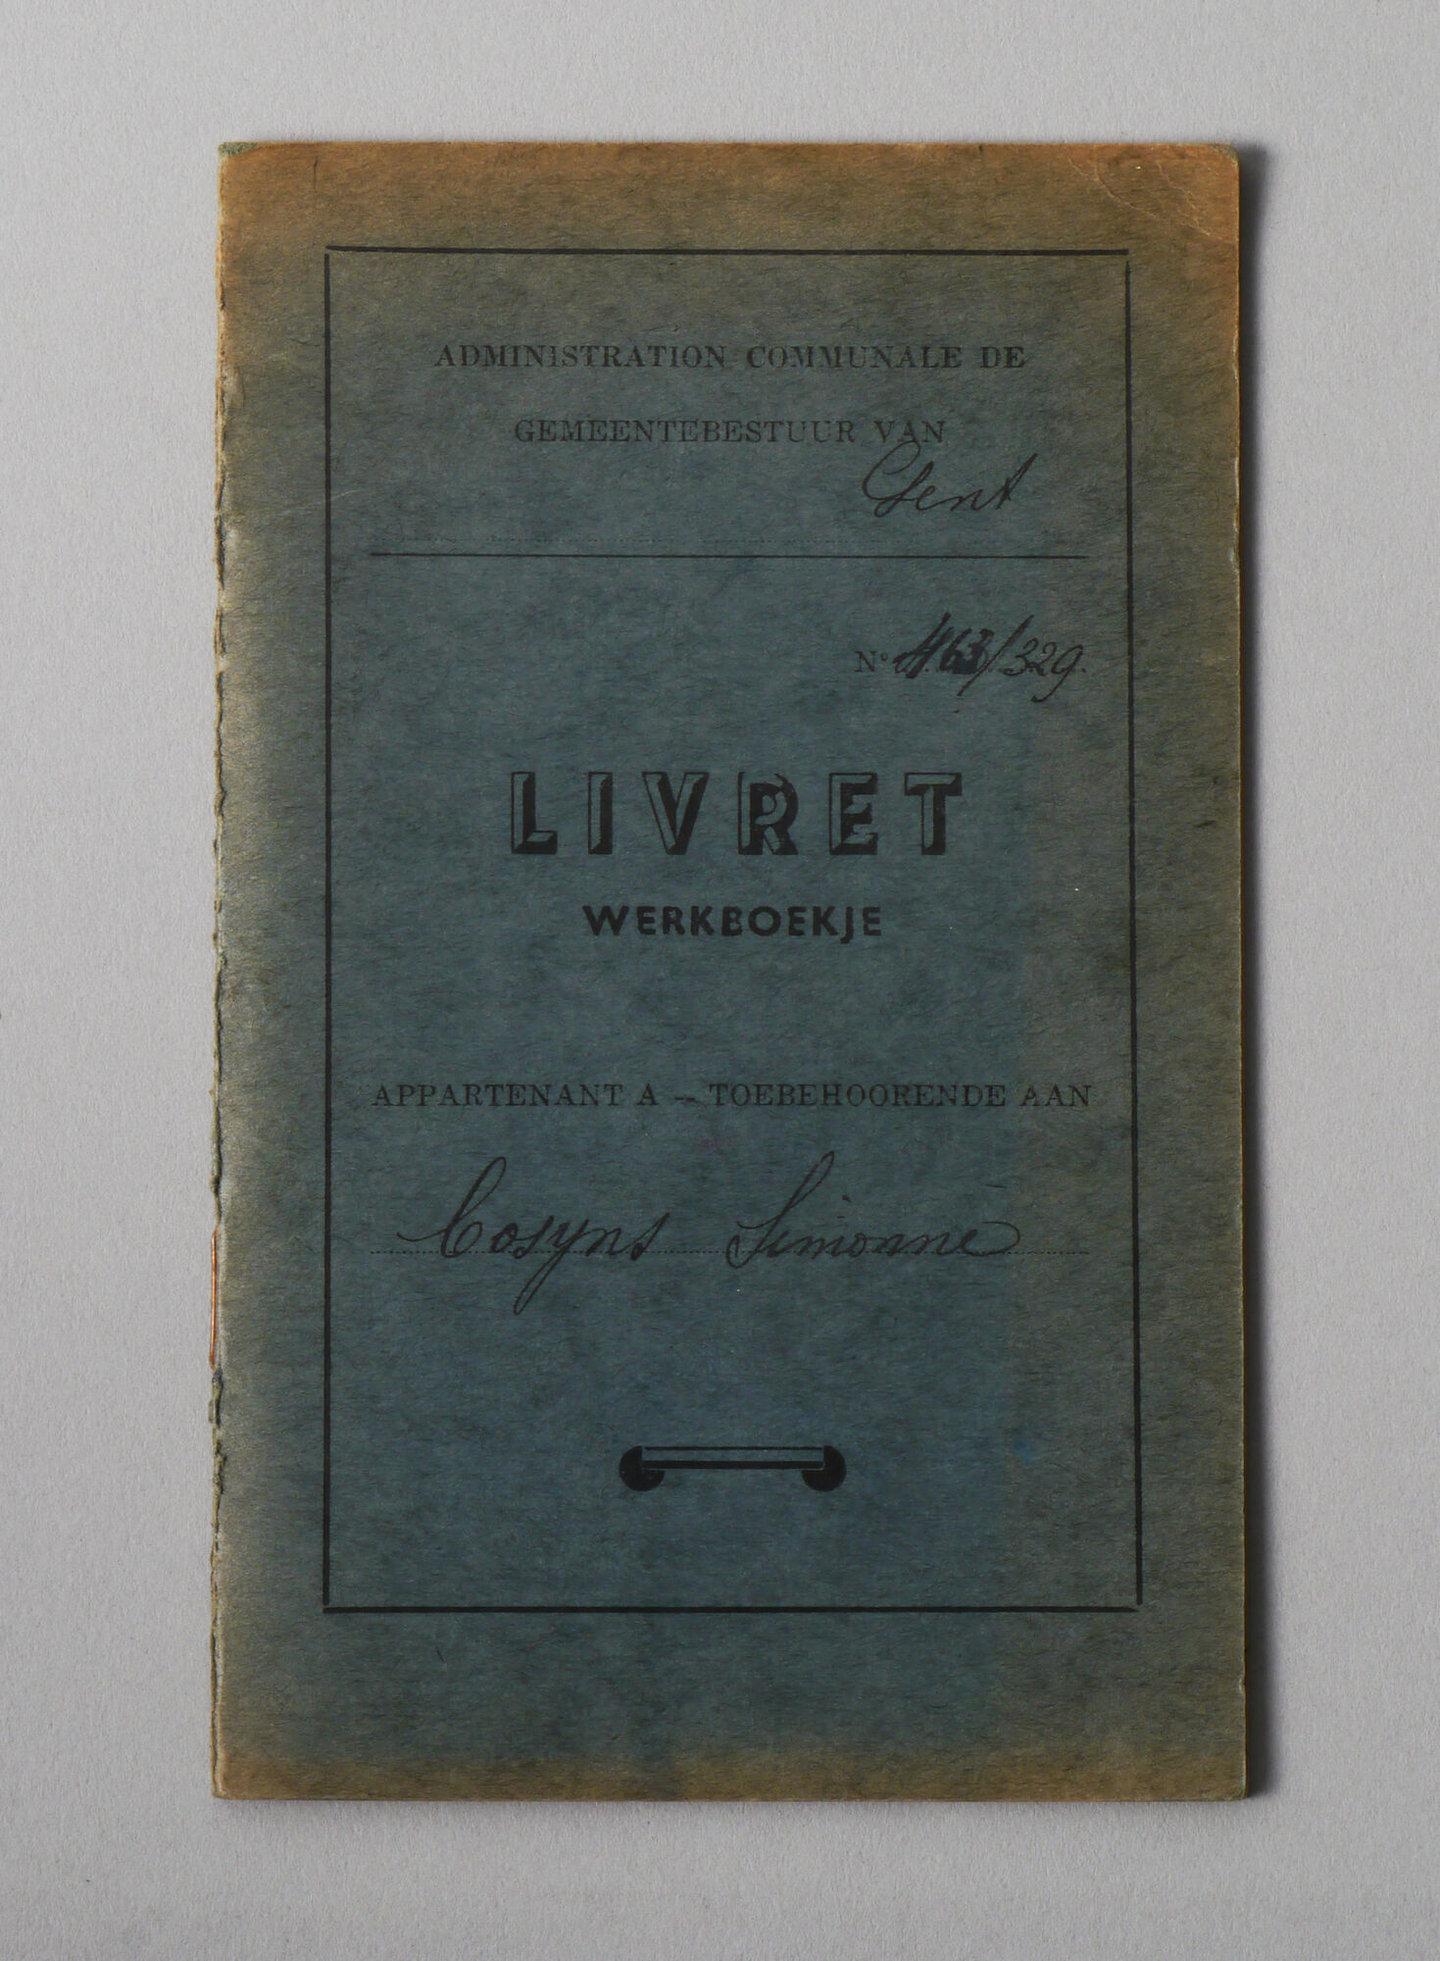 Werkboekje van Simonne Cosyns